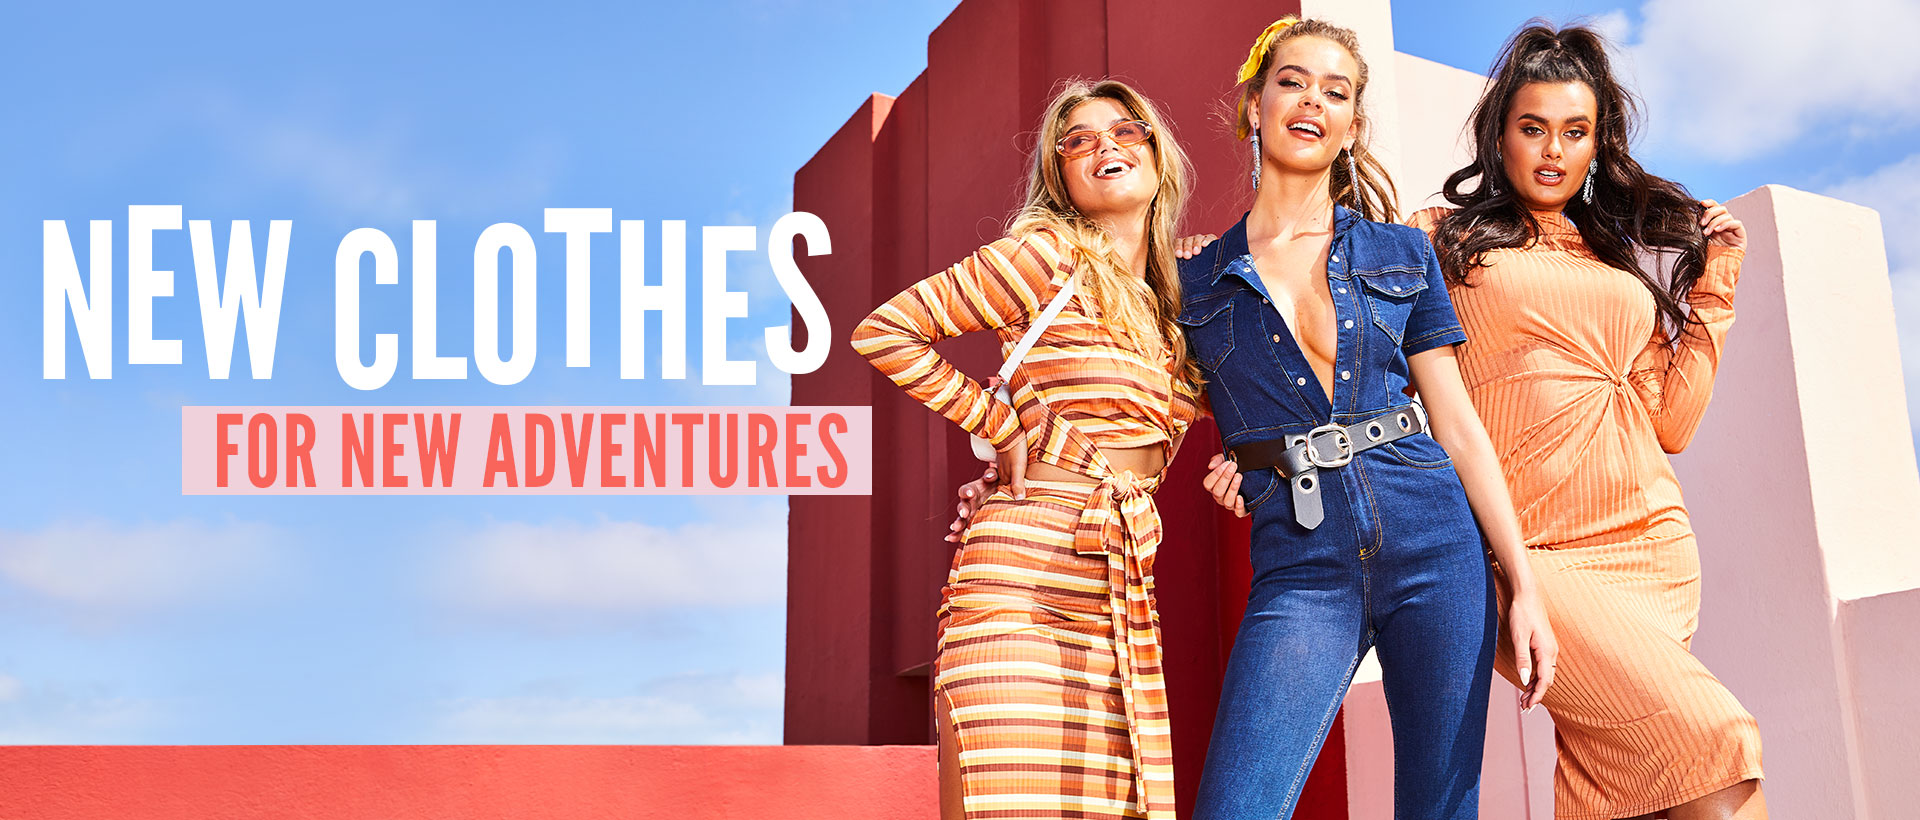 9756d8894240 Clothes | Women's & Men's Clothing & Fashion | Online Shopping – boohoo